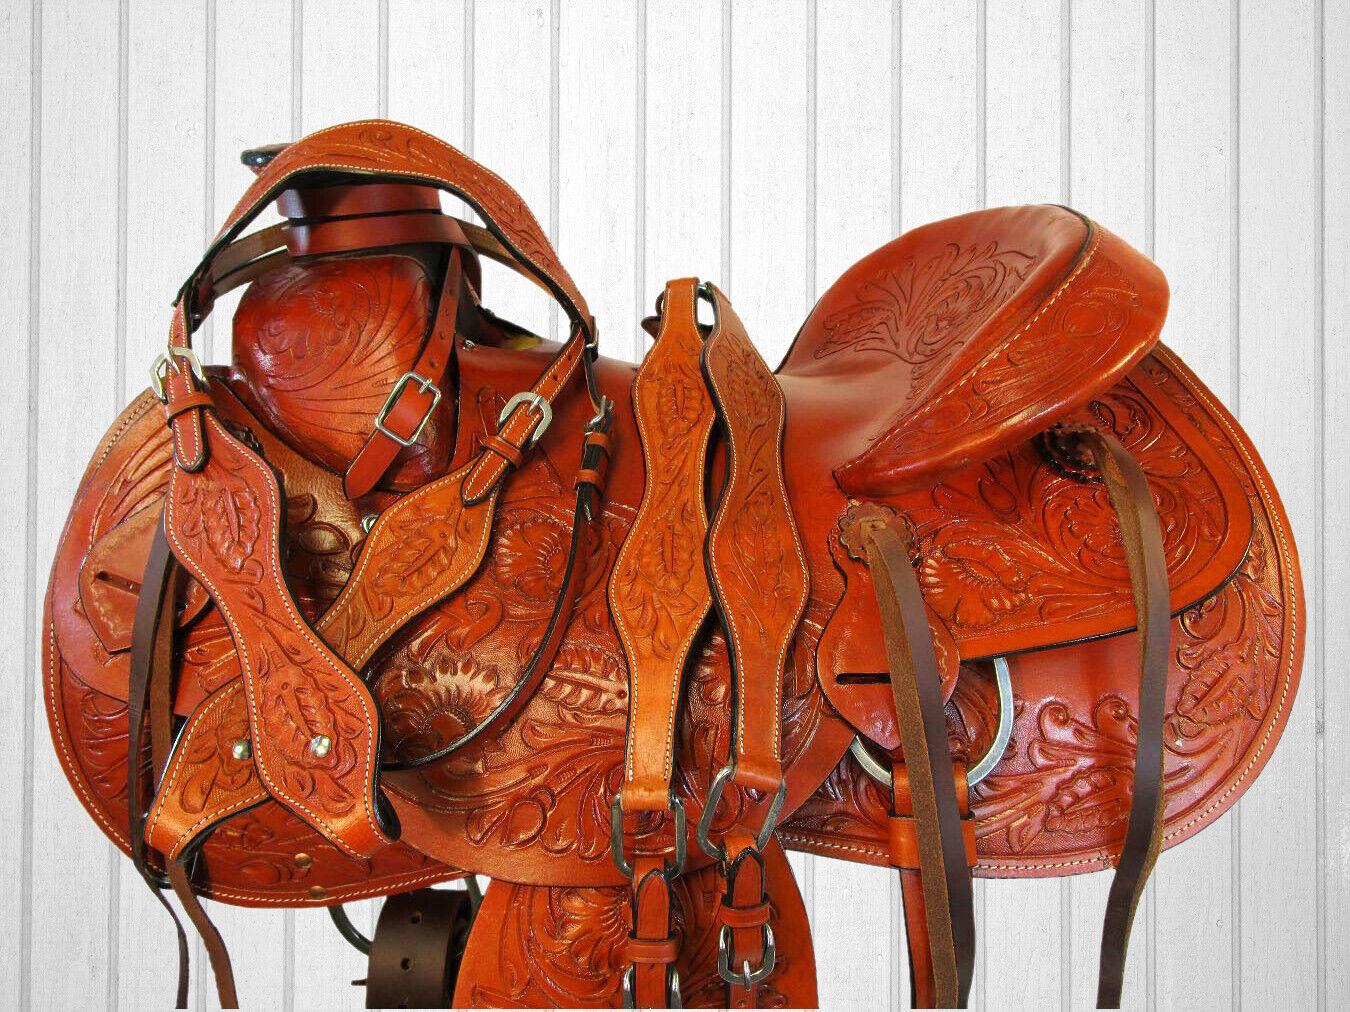 DEEP SEAT WESTERN HORSE SADDLE RANCH ROPING ROPER PLEASURE WORK HORSE 16 17